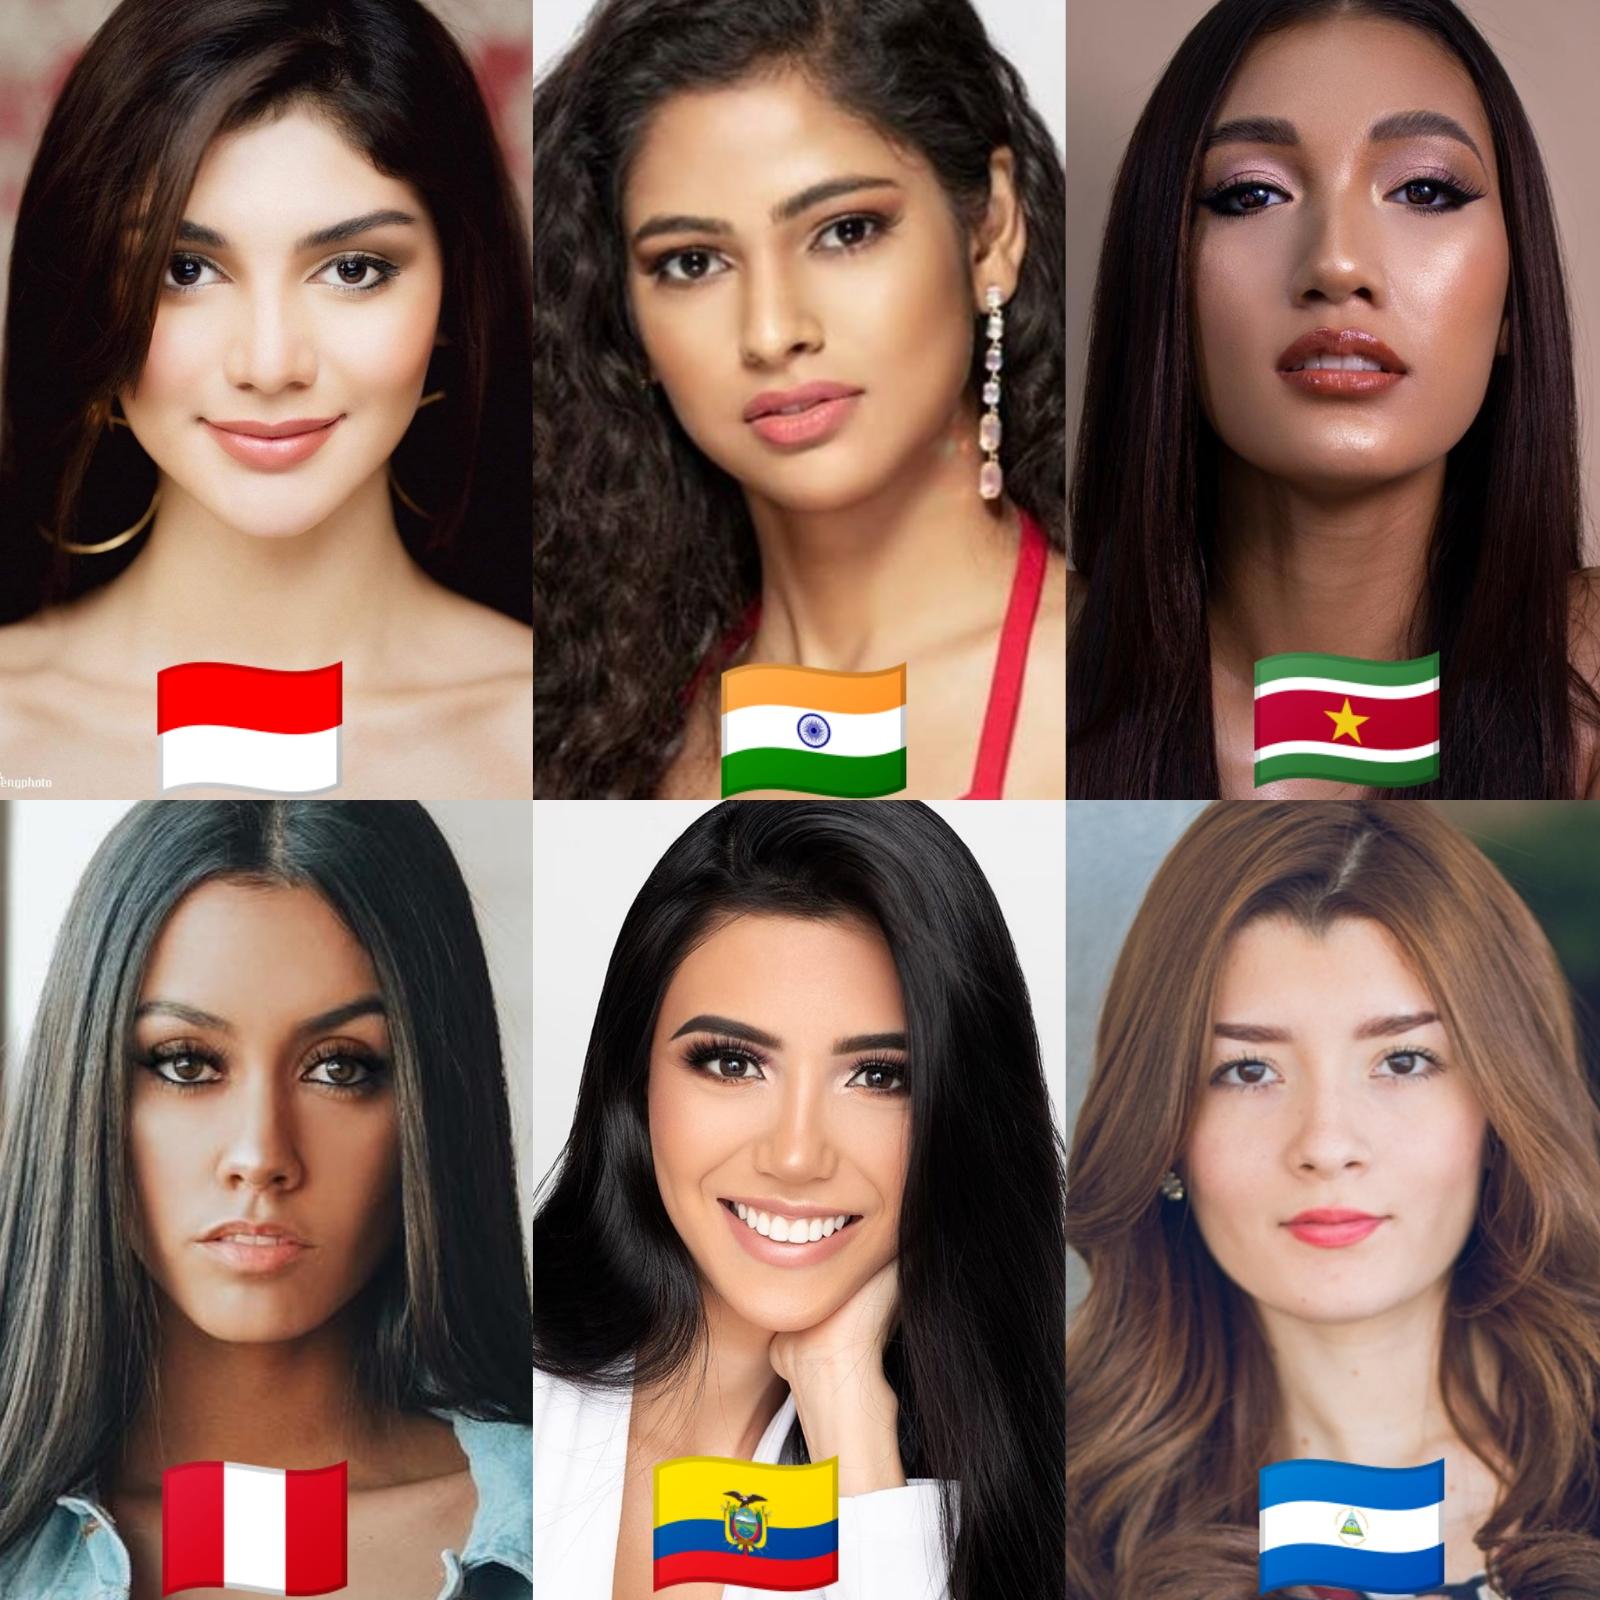 Contestan-Miss-Supranational-2020-Indonesia-Jihane-Almira-Chedid-India-Aavriti-Choudhary-Suriname-Farisha-Tjin-Asjoe-Peru-Camila-Escribenss-Ecuador-Justeen-Cruz-Lara-El-Salvador-Adriana-Camila-Luna